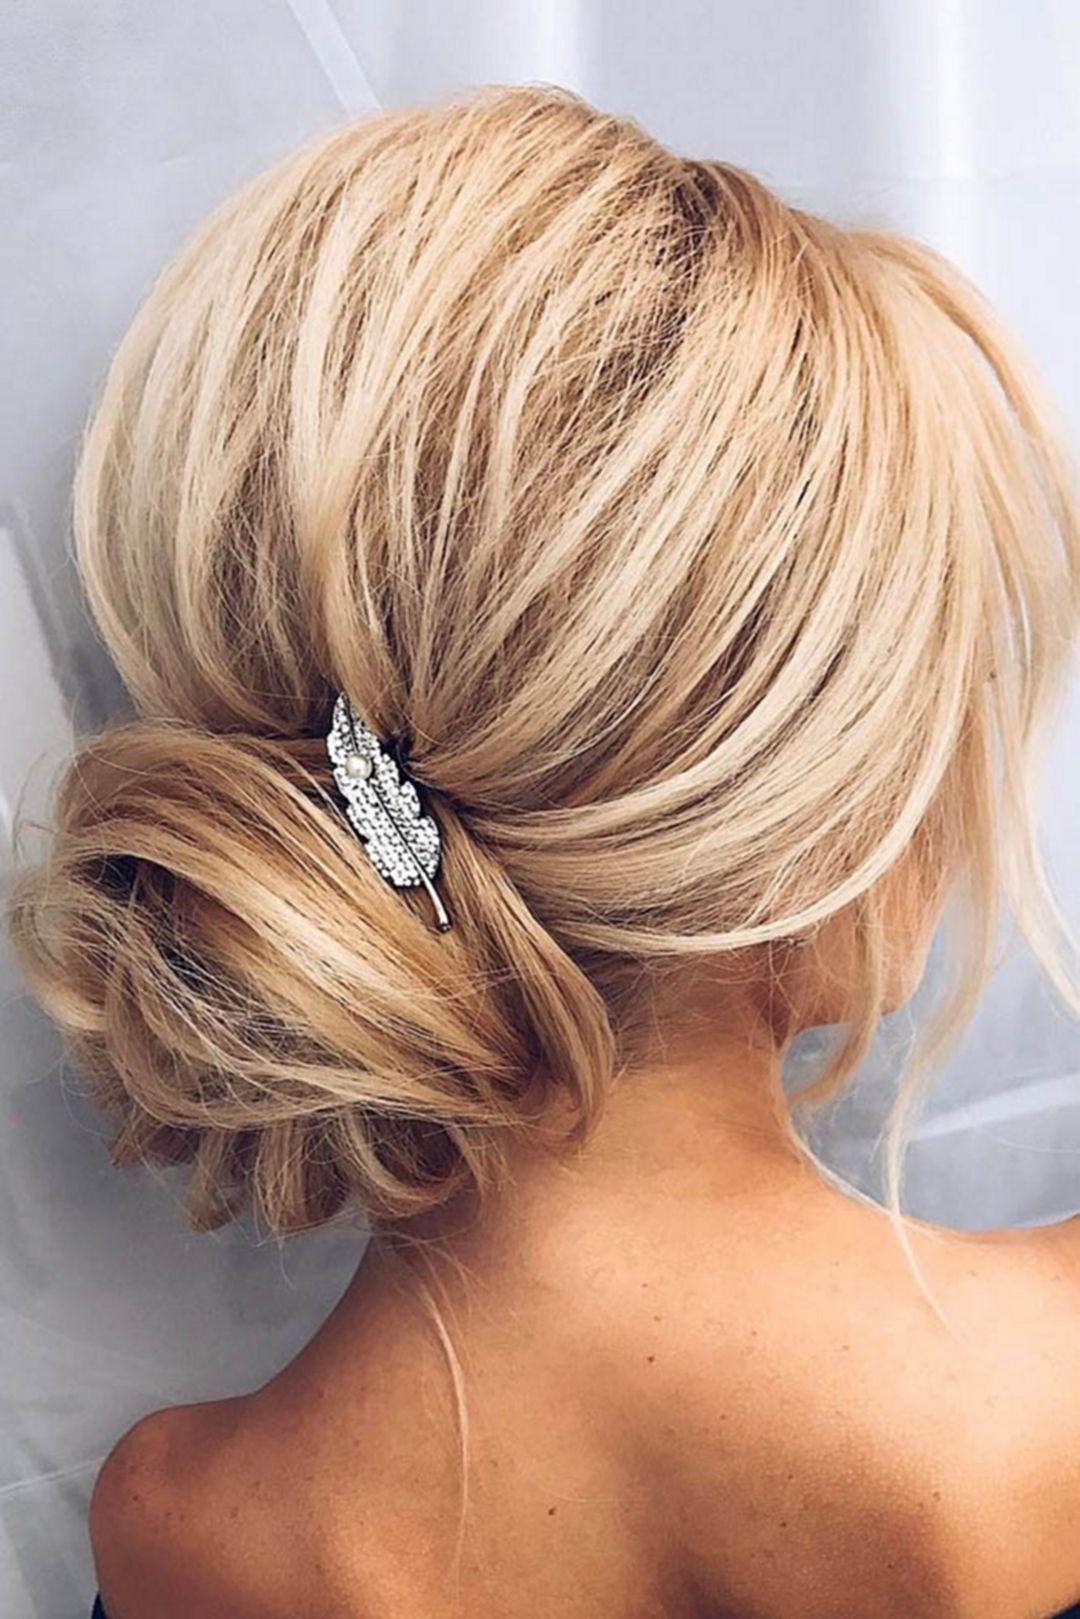 60+ Wonderful Bridesmaid Updo Hairstyles | Bridesmaid updo ...